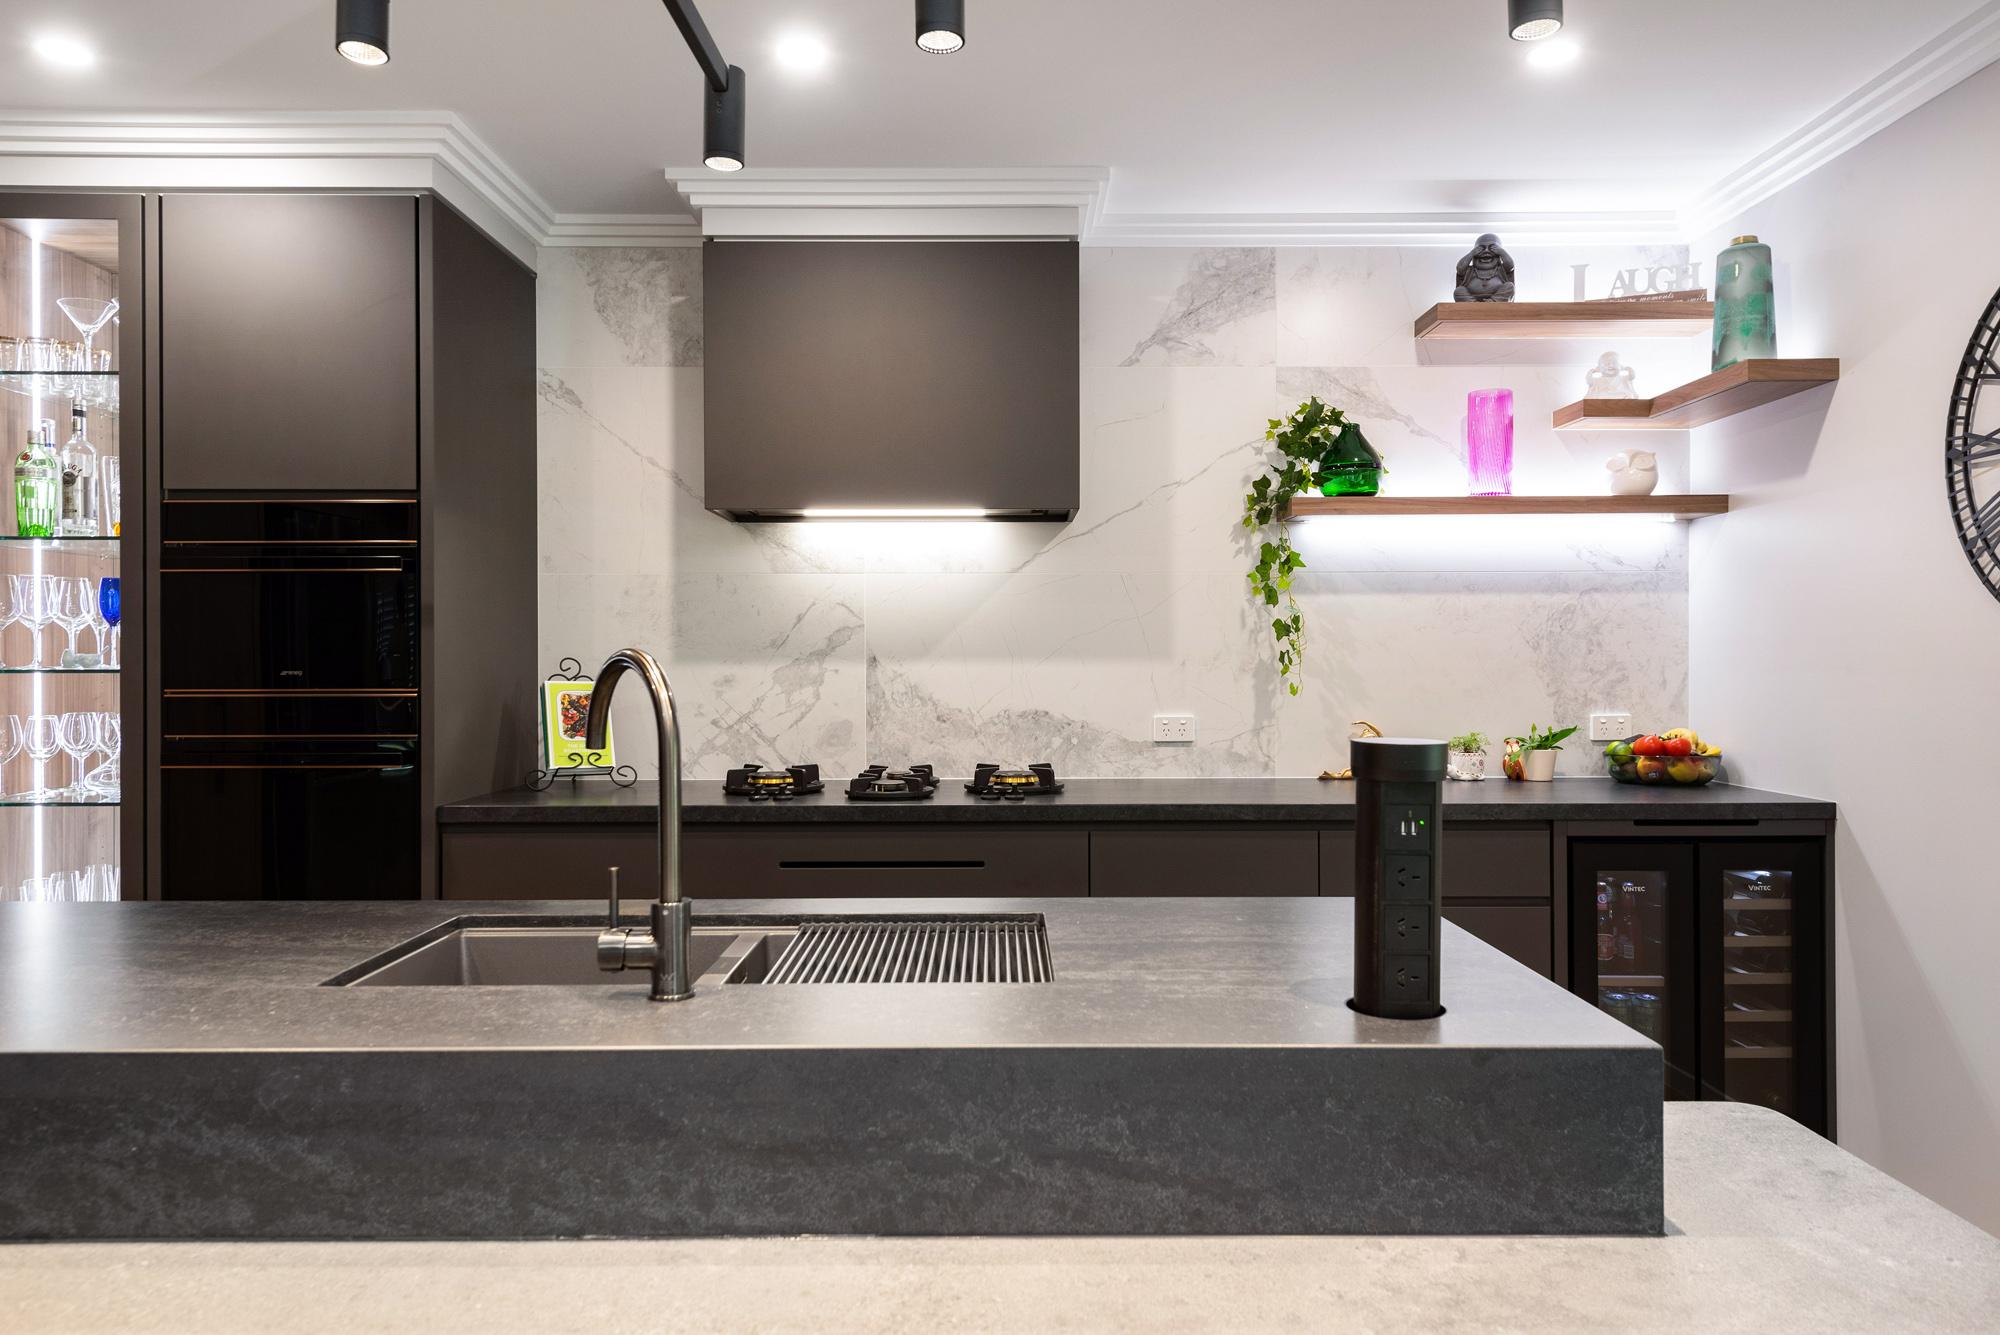 Modern industrial kitchen, concrete look benchtops, marble tile splashback, timber shelves, feature lighting